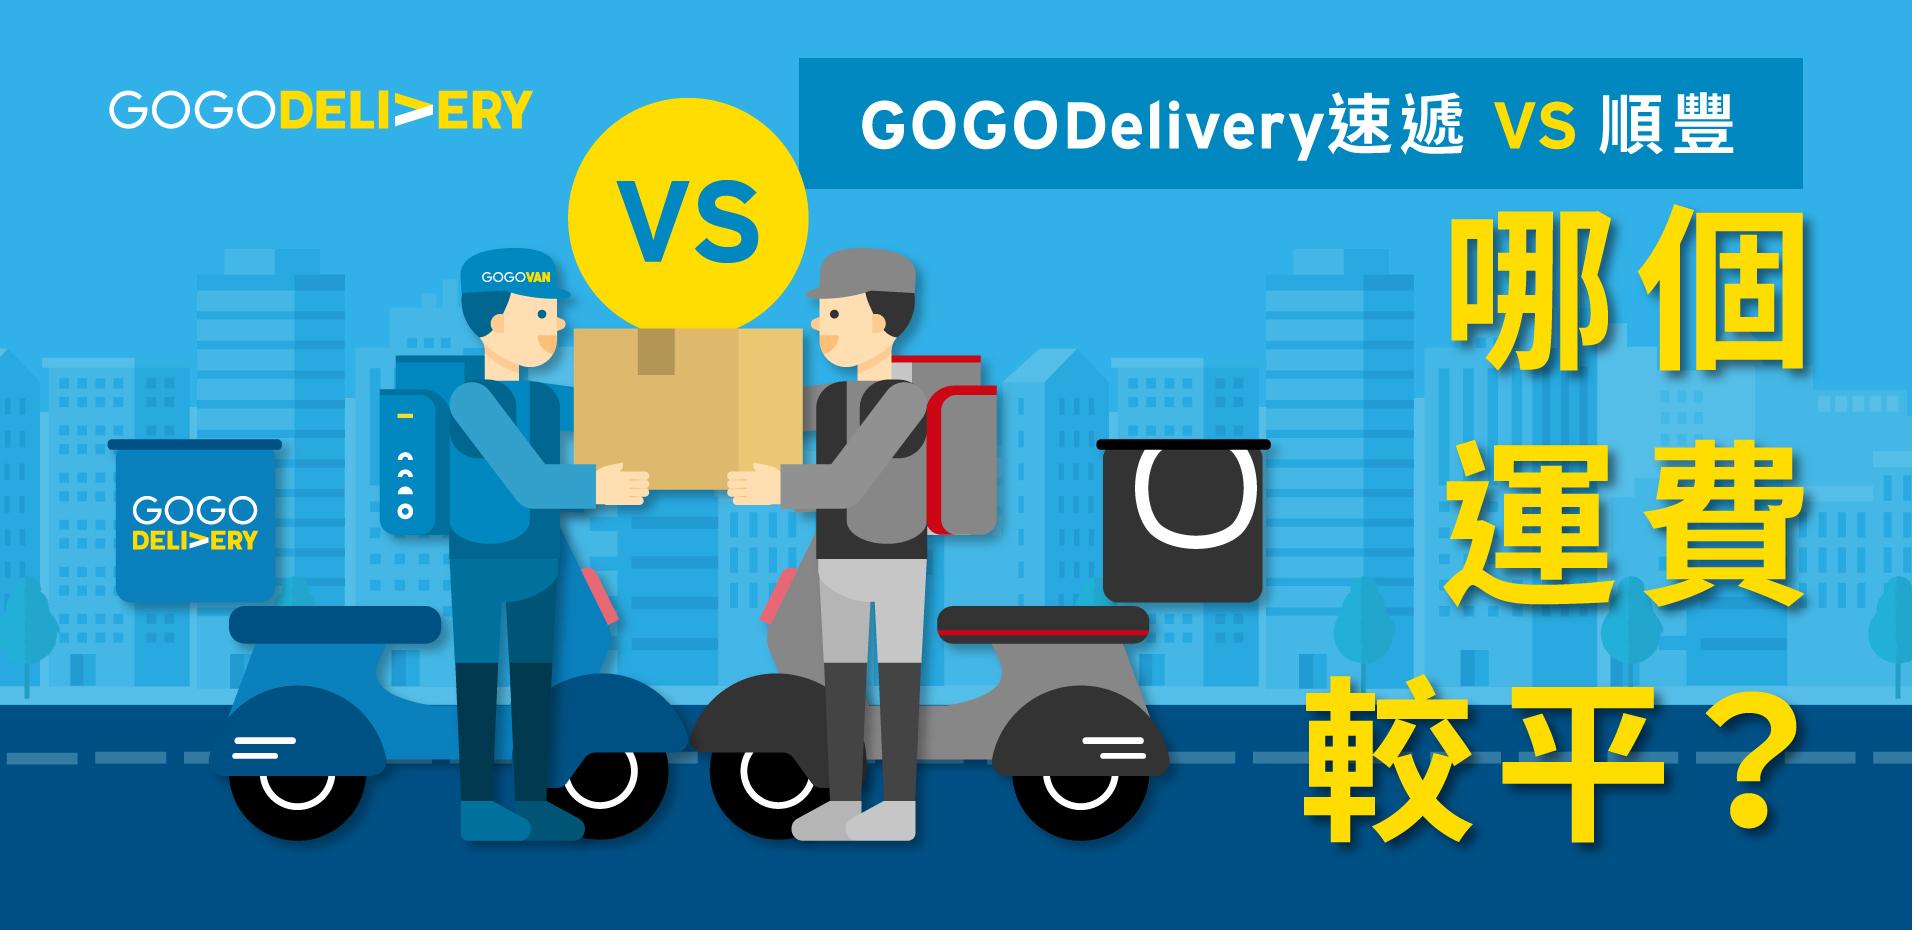 OGODelivery速遞 vs 順豐: 哪個運費較平?